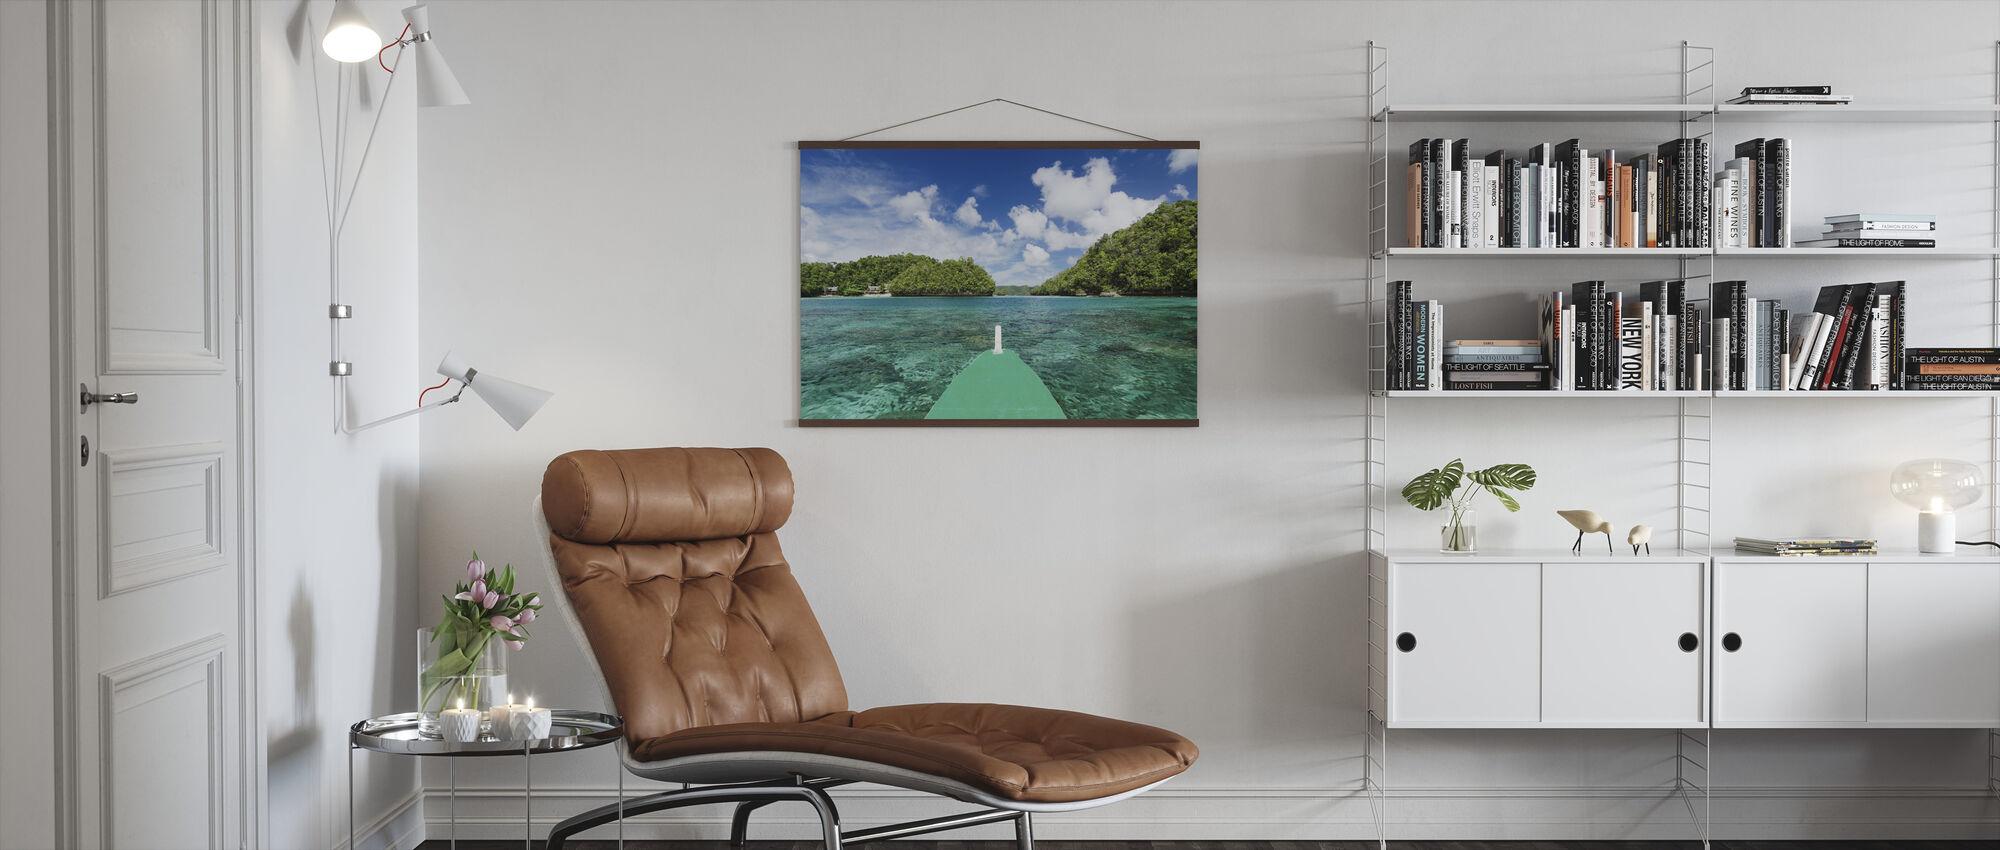 Bangka View of Bucas Grande, Indonesia, South East Asia - Poster - Living Room